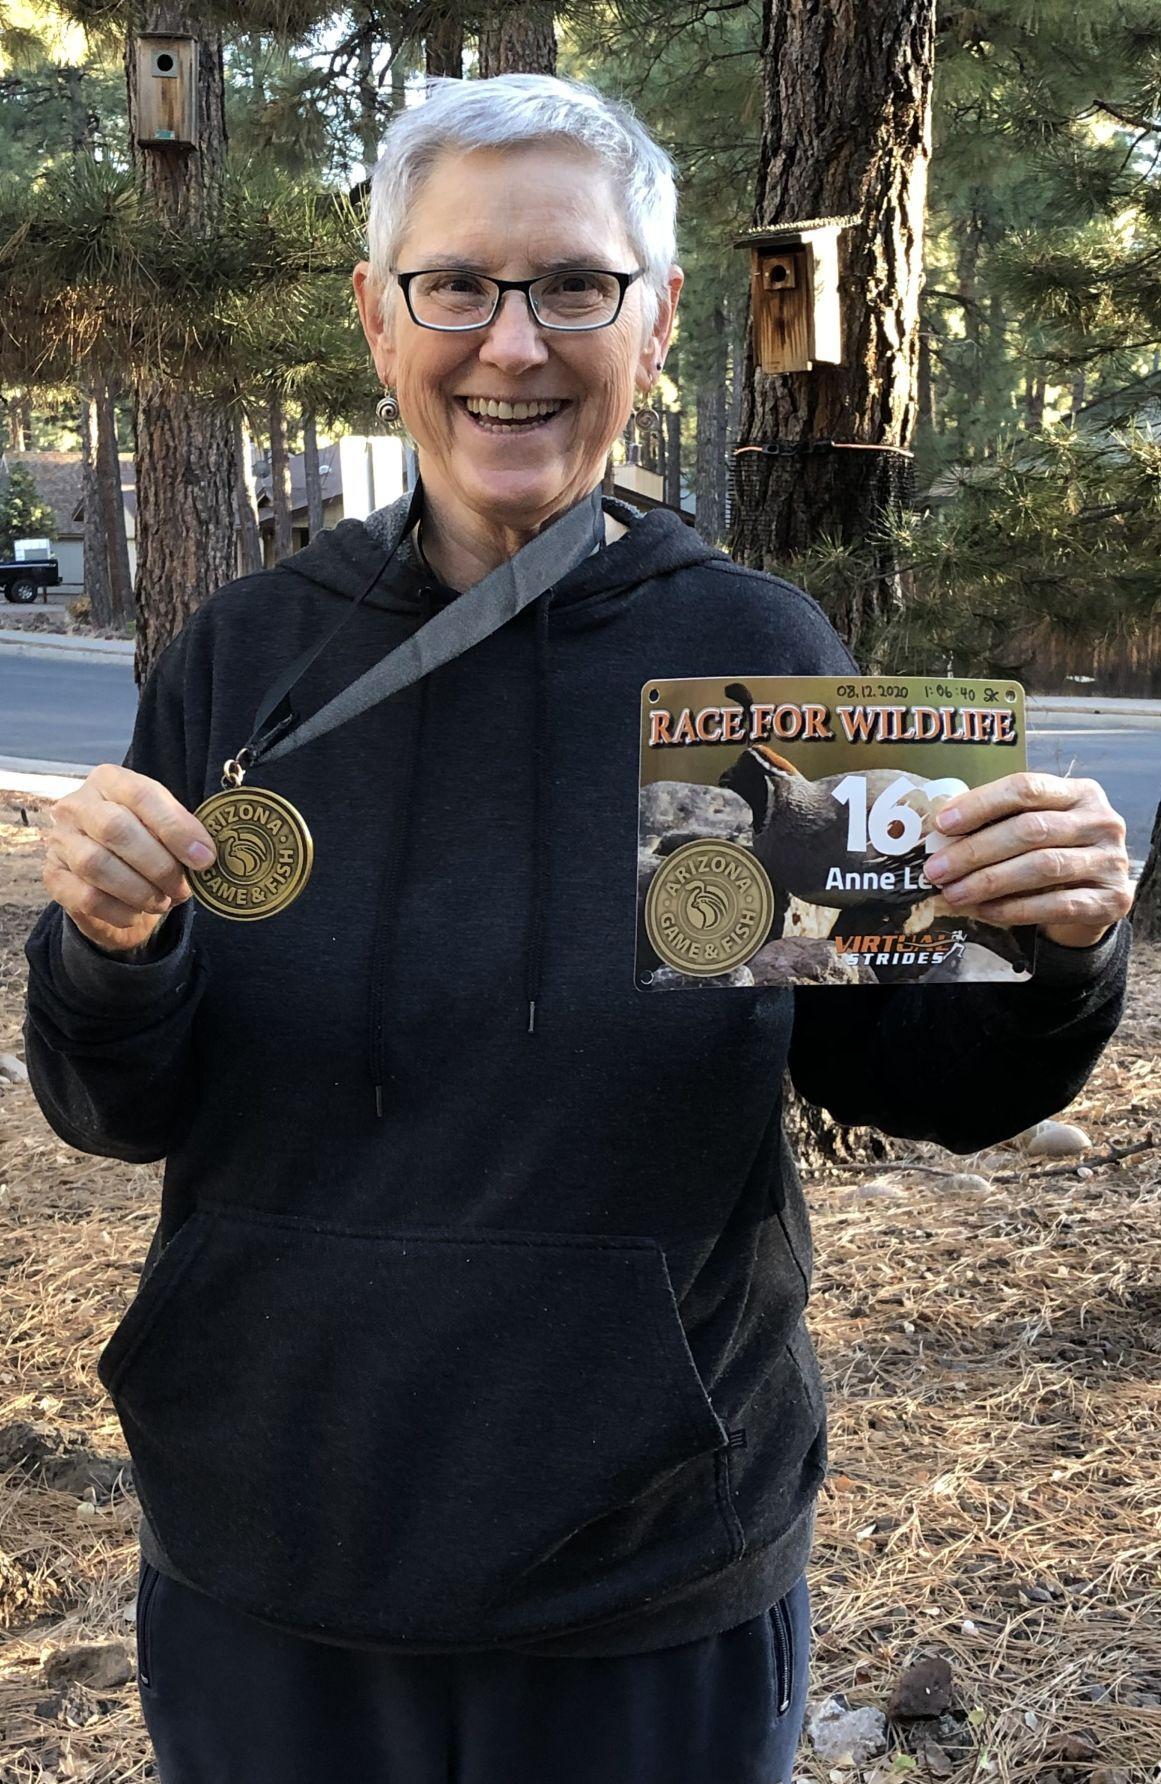 Anne Leota Hart virtual 5K finish